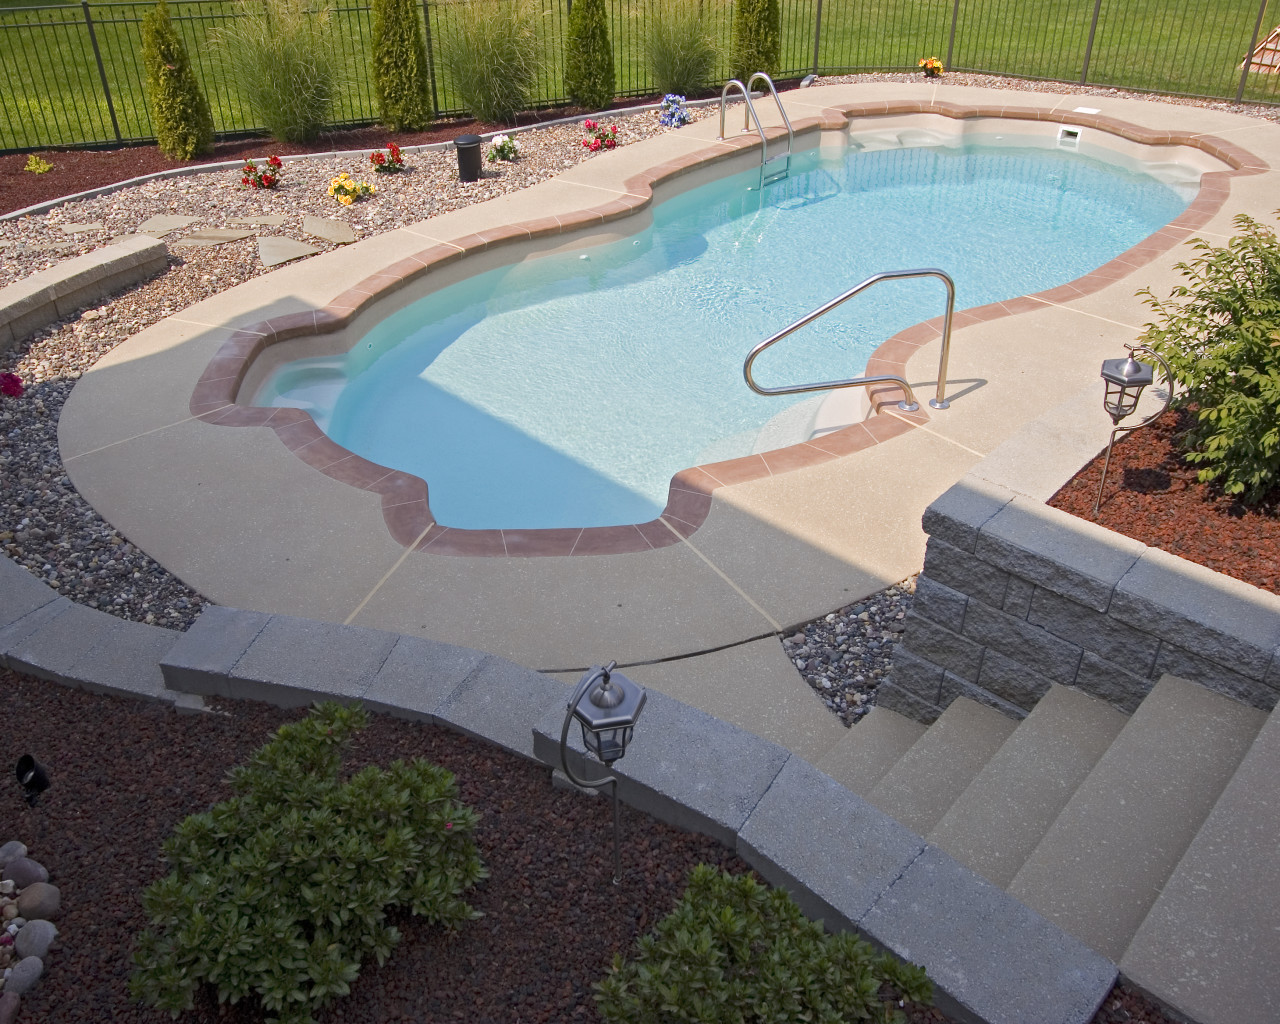 2 - Utopia Pool